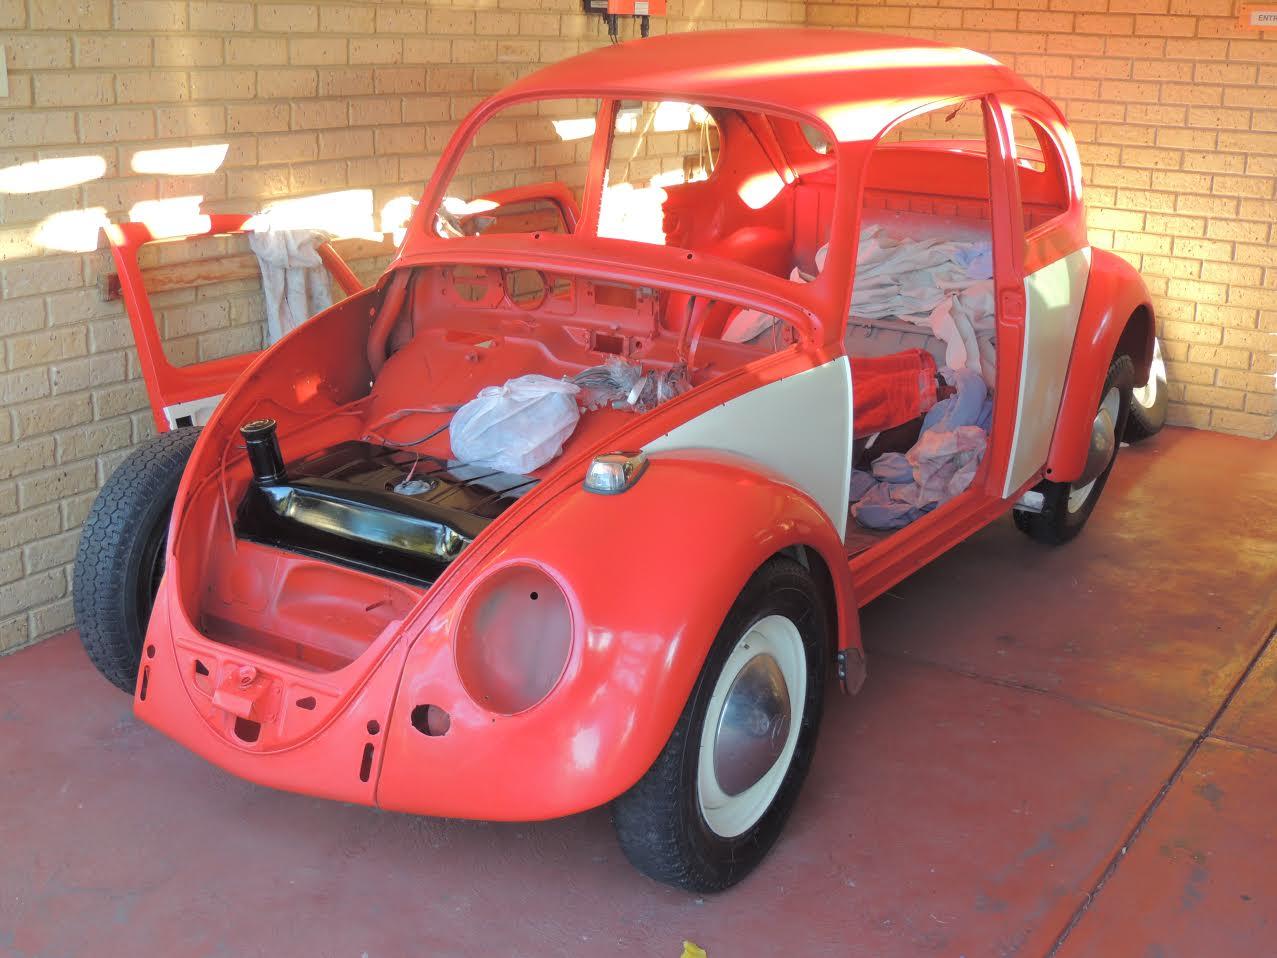 Graham Patterson's RHD '67 Beetle